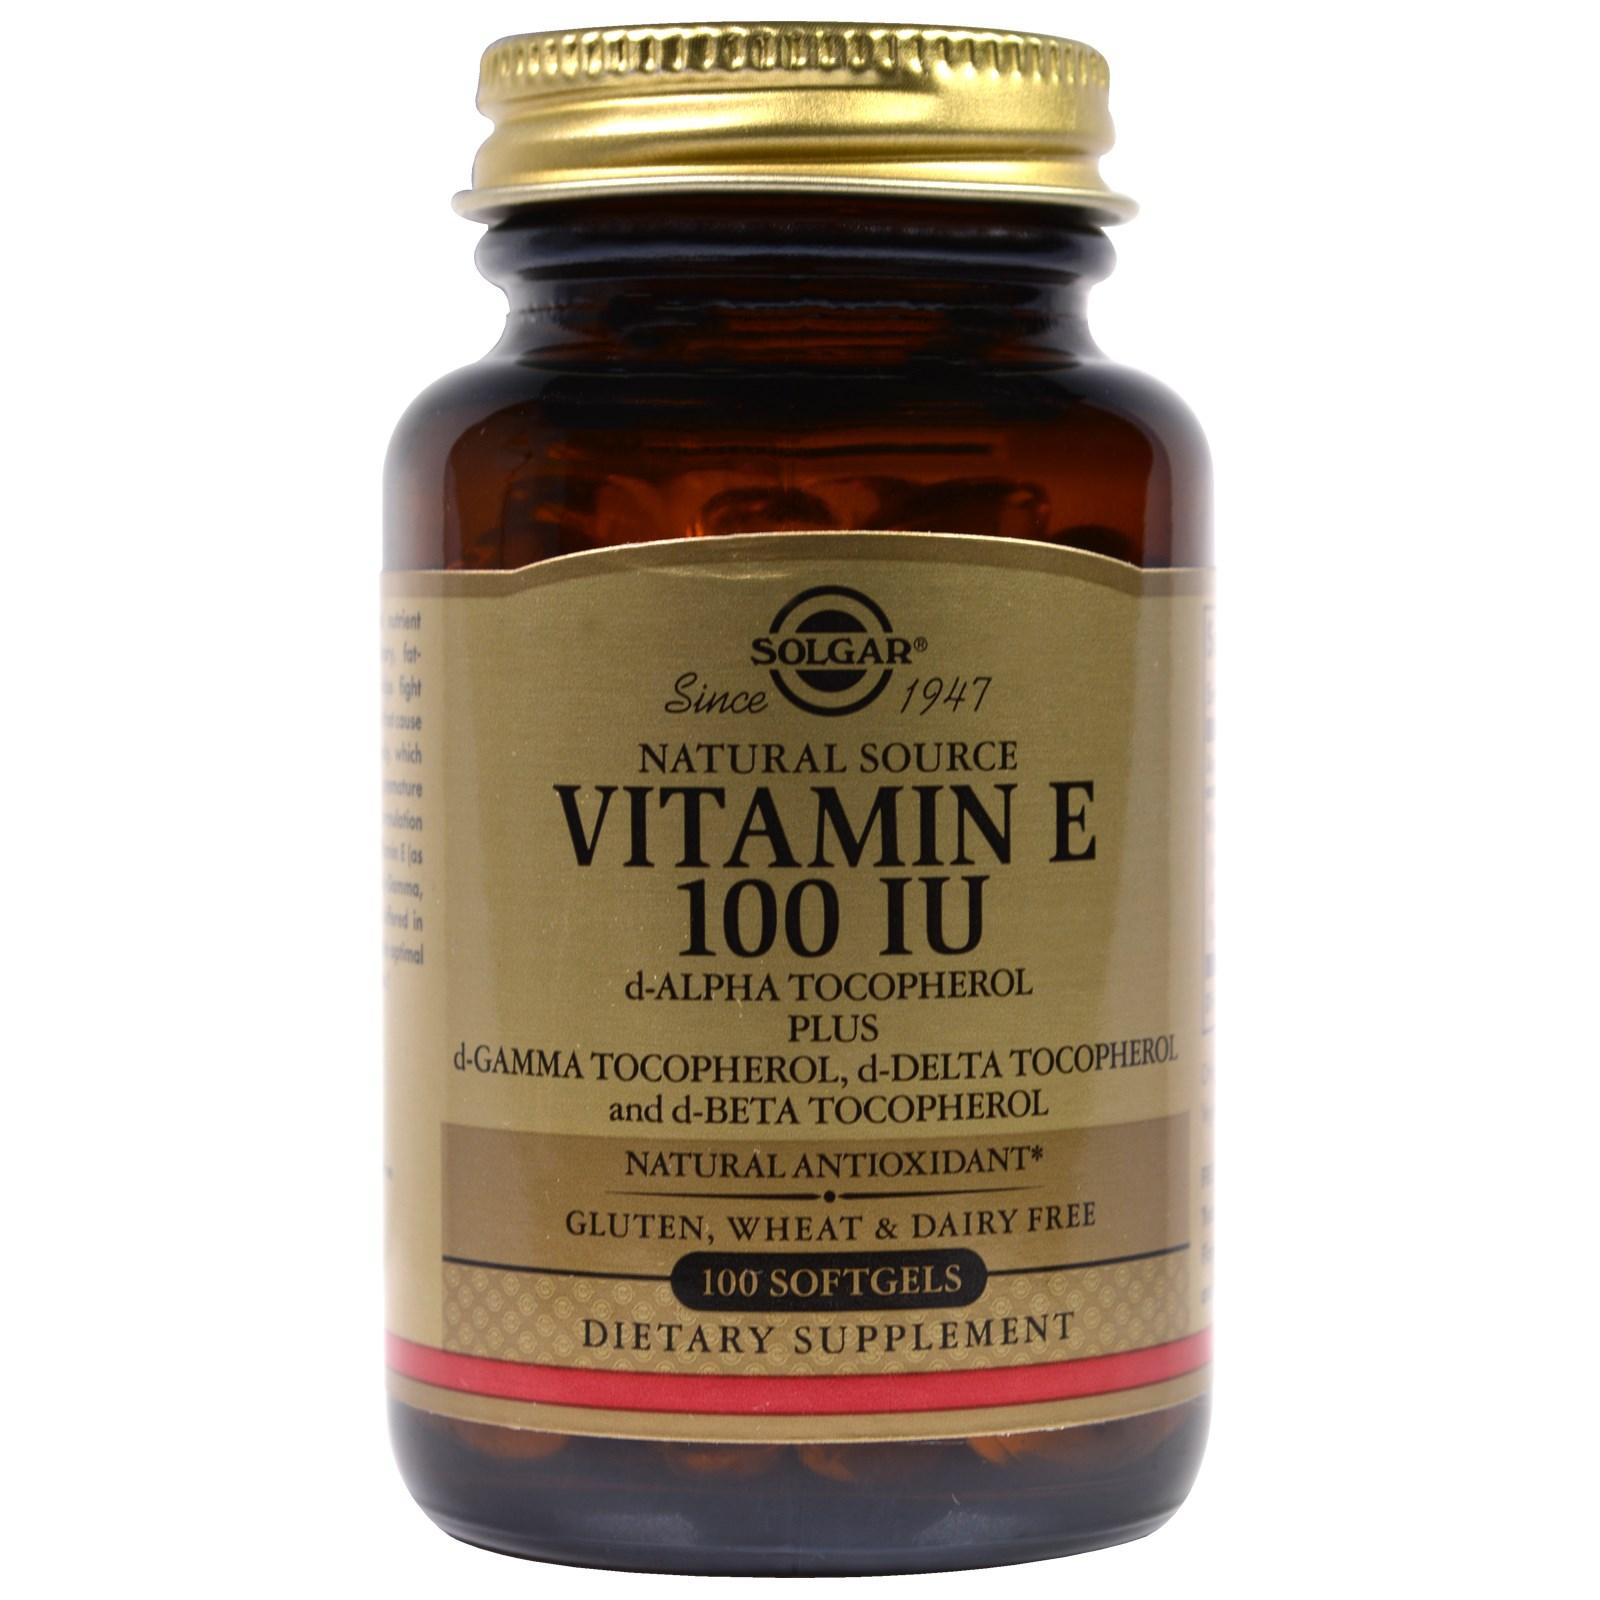 Vitamin E hiệu Solgar, 100 IU, lọ 100 viên nang mềm